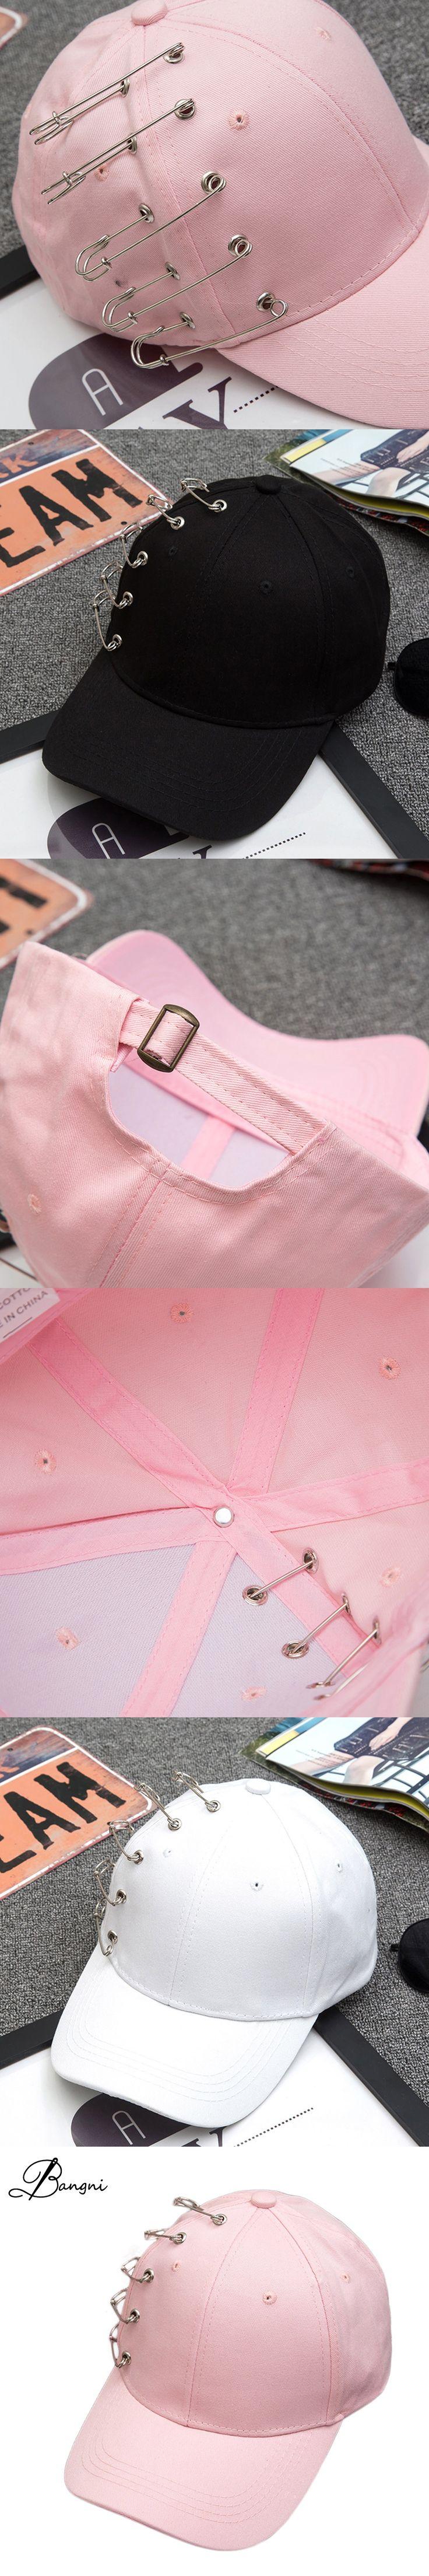 Women Black Pink White Fashion Pin Baseball Cap Snapback Caps Dad Hat Harajuku Hat For Men Gorras Bone Casquette Hip Hop Caps